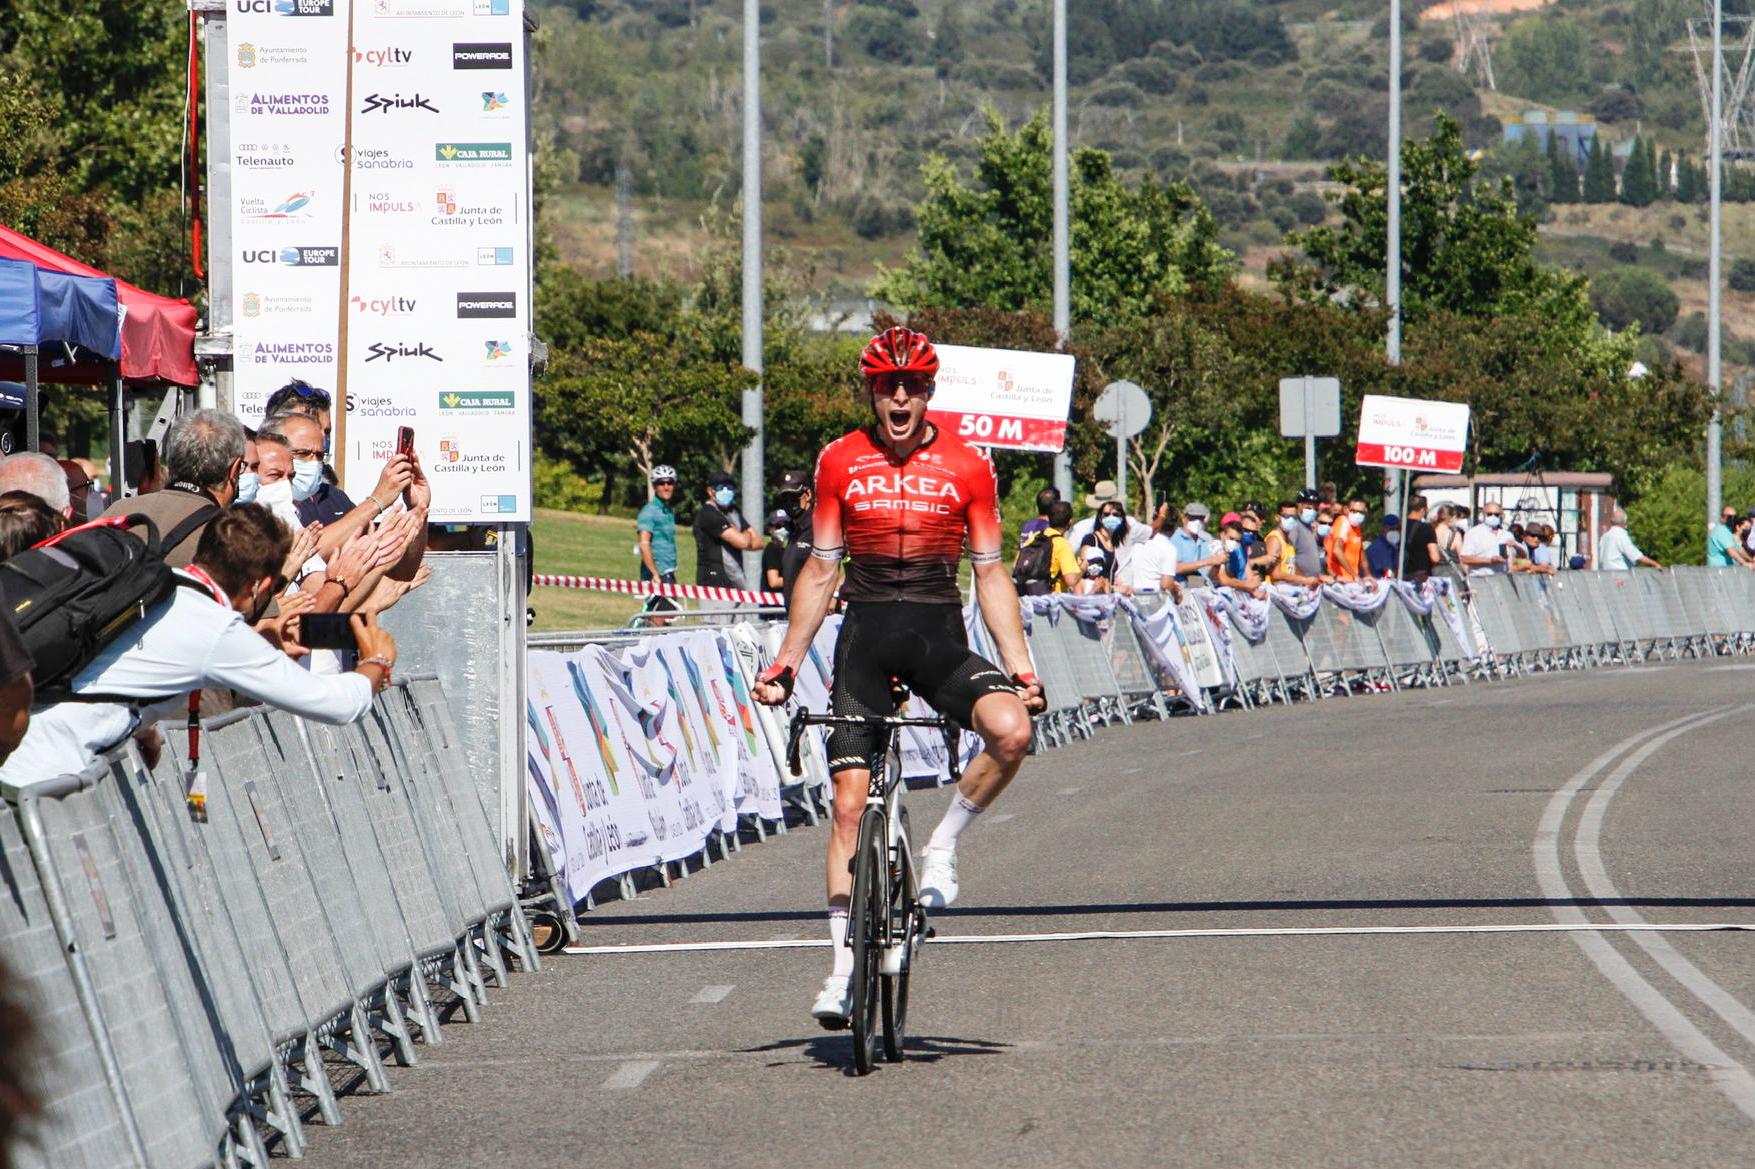 Matîs Louvel wins the Vuelta a Castilla y Leon